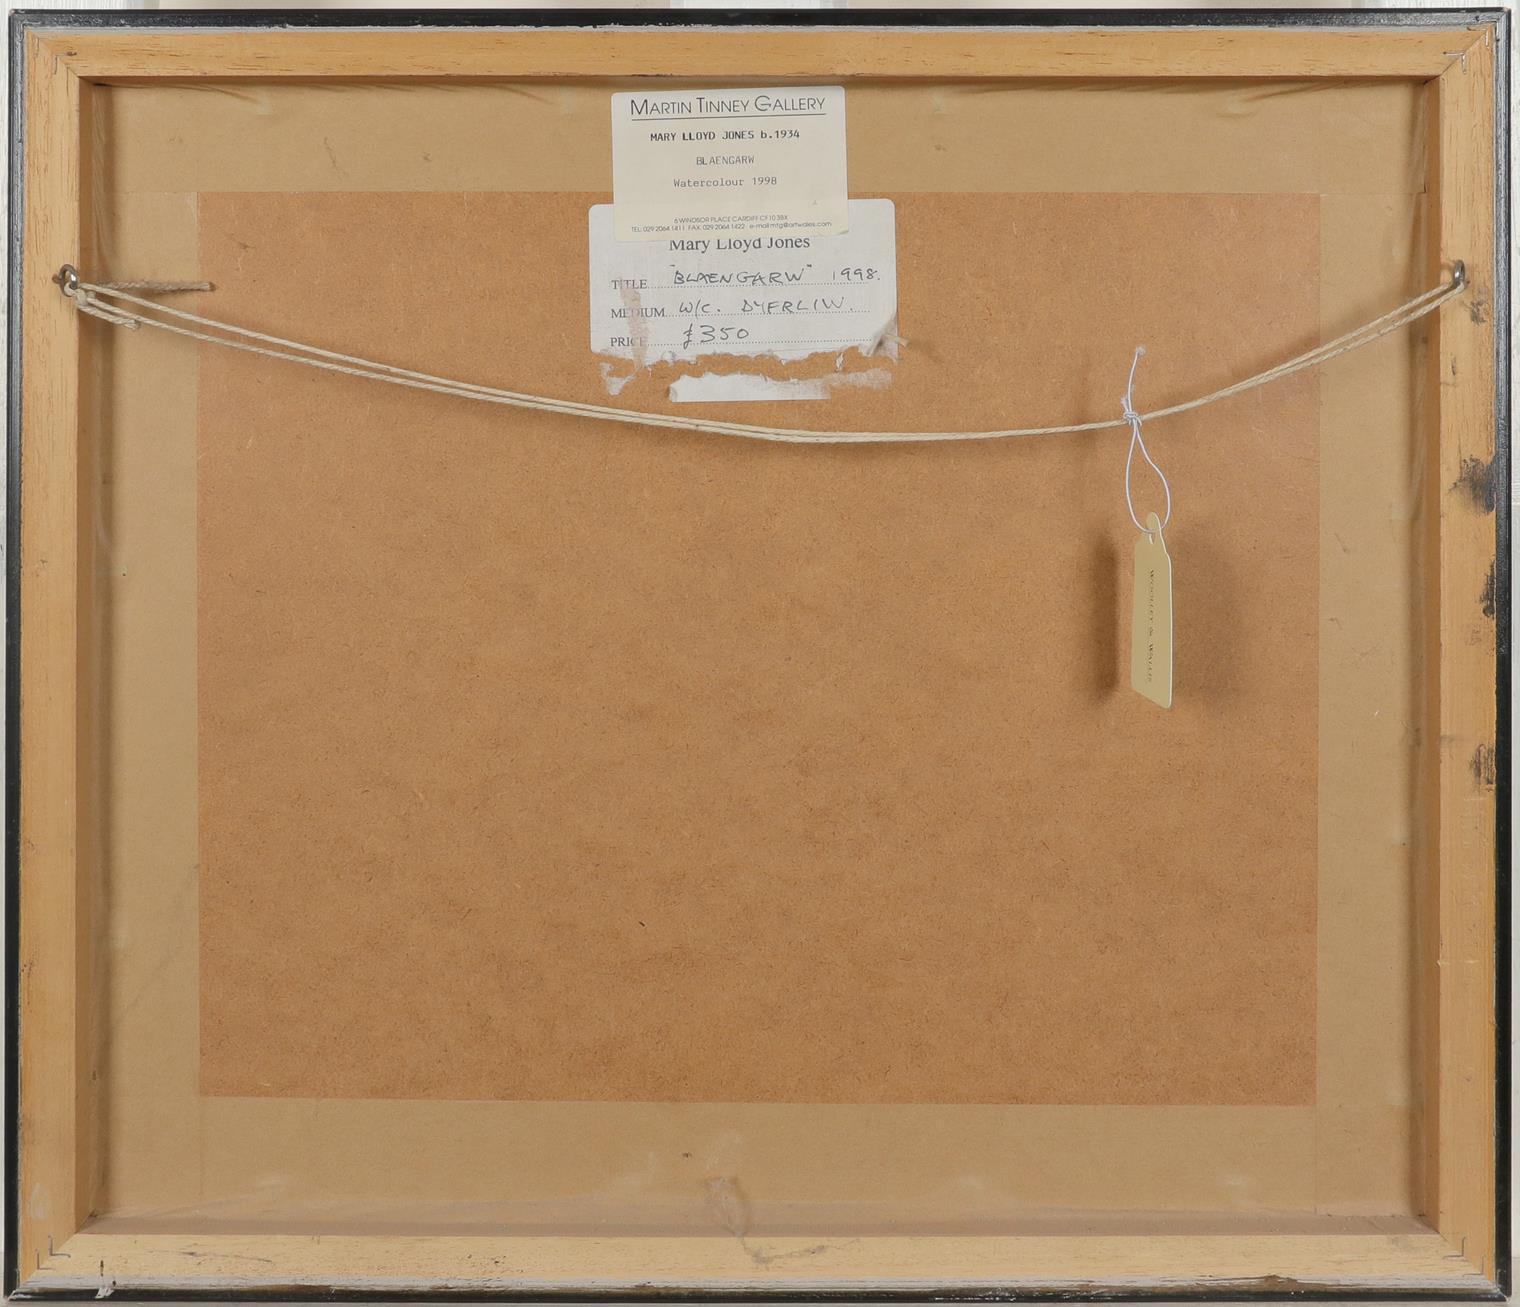 ‡Mary Lloyd Jones RCA, FLSW (Welsh b.1934) Blaengarw Signed and dated Mary Lloyd Jones 1998. ( - Image 3 of 3